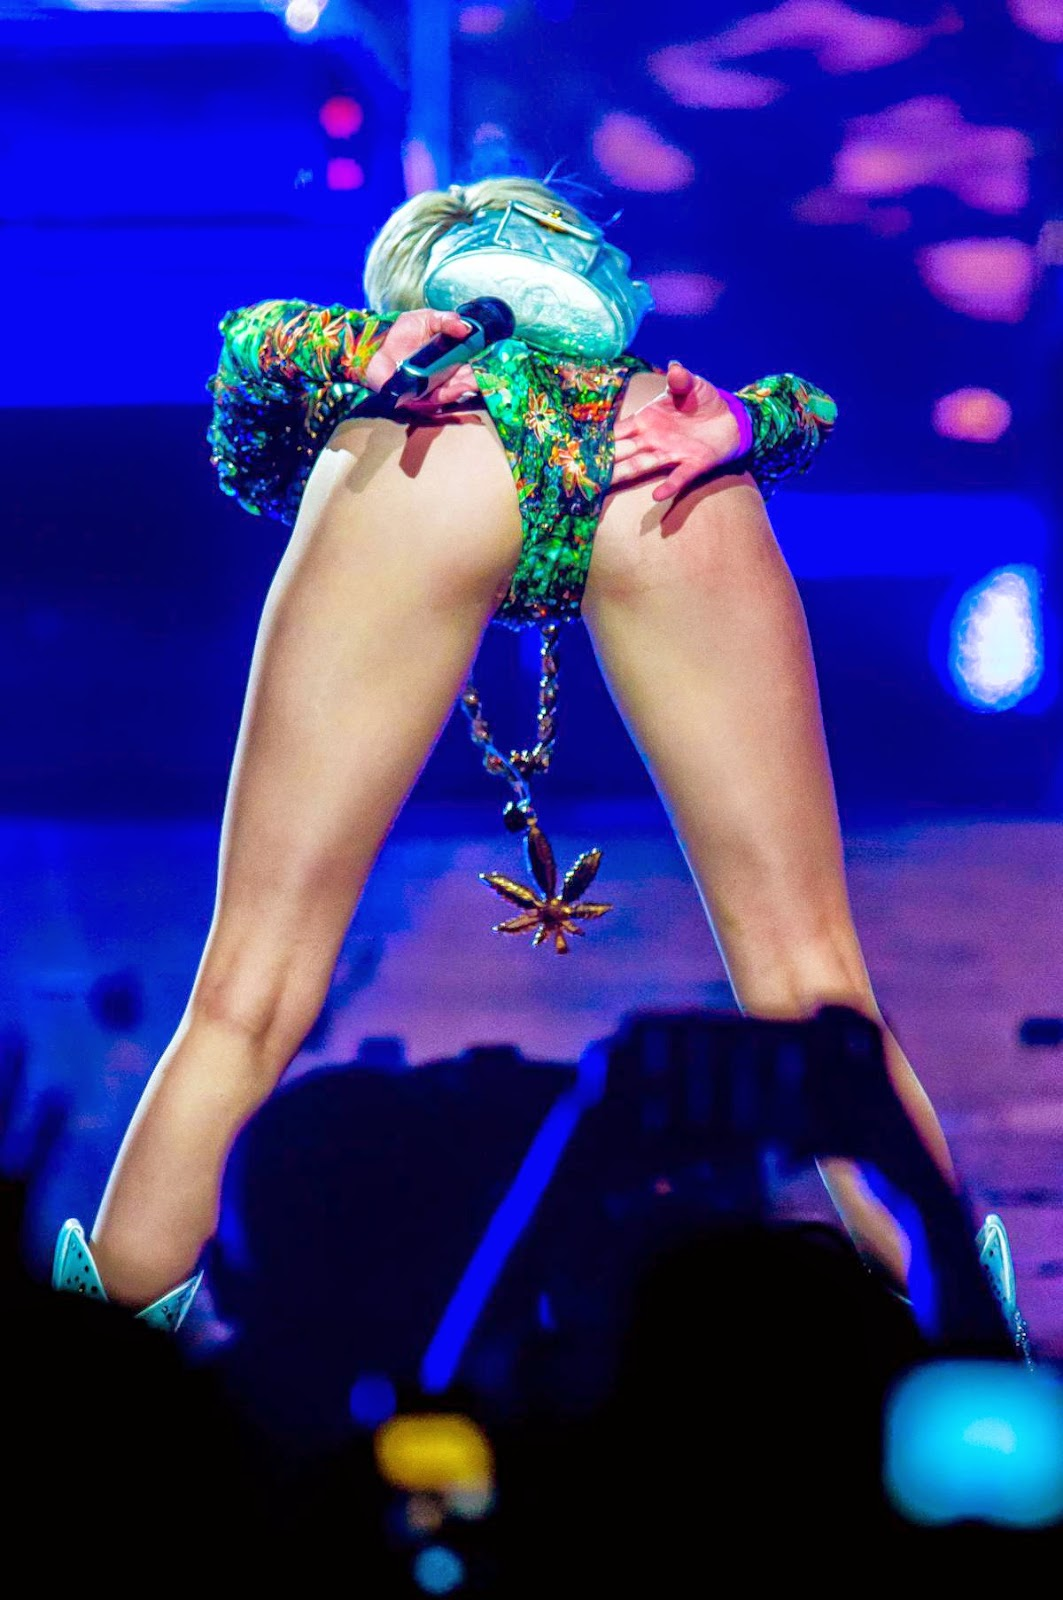 PhotoFunMasti: Miley Cyrus - Photos from Bangerz Tour in ...